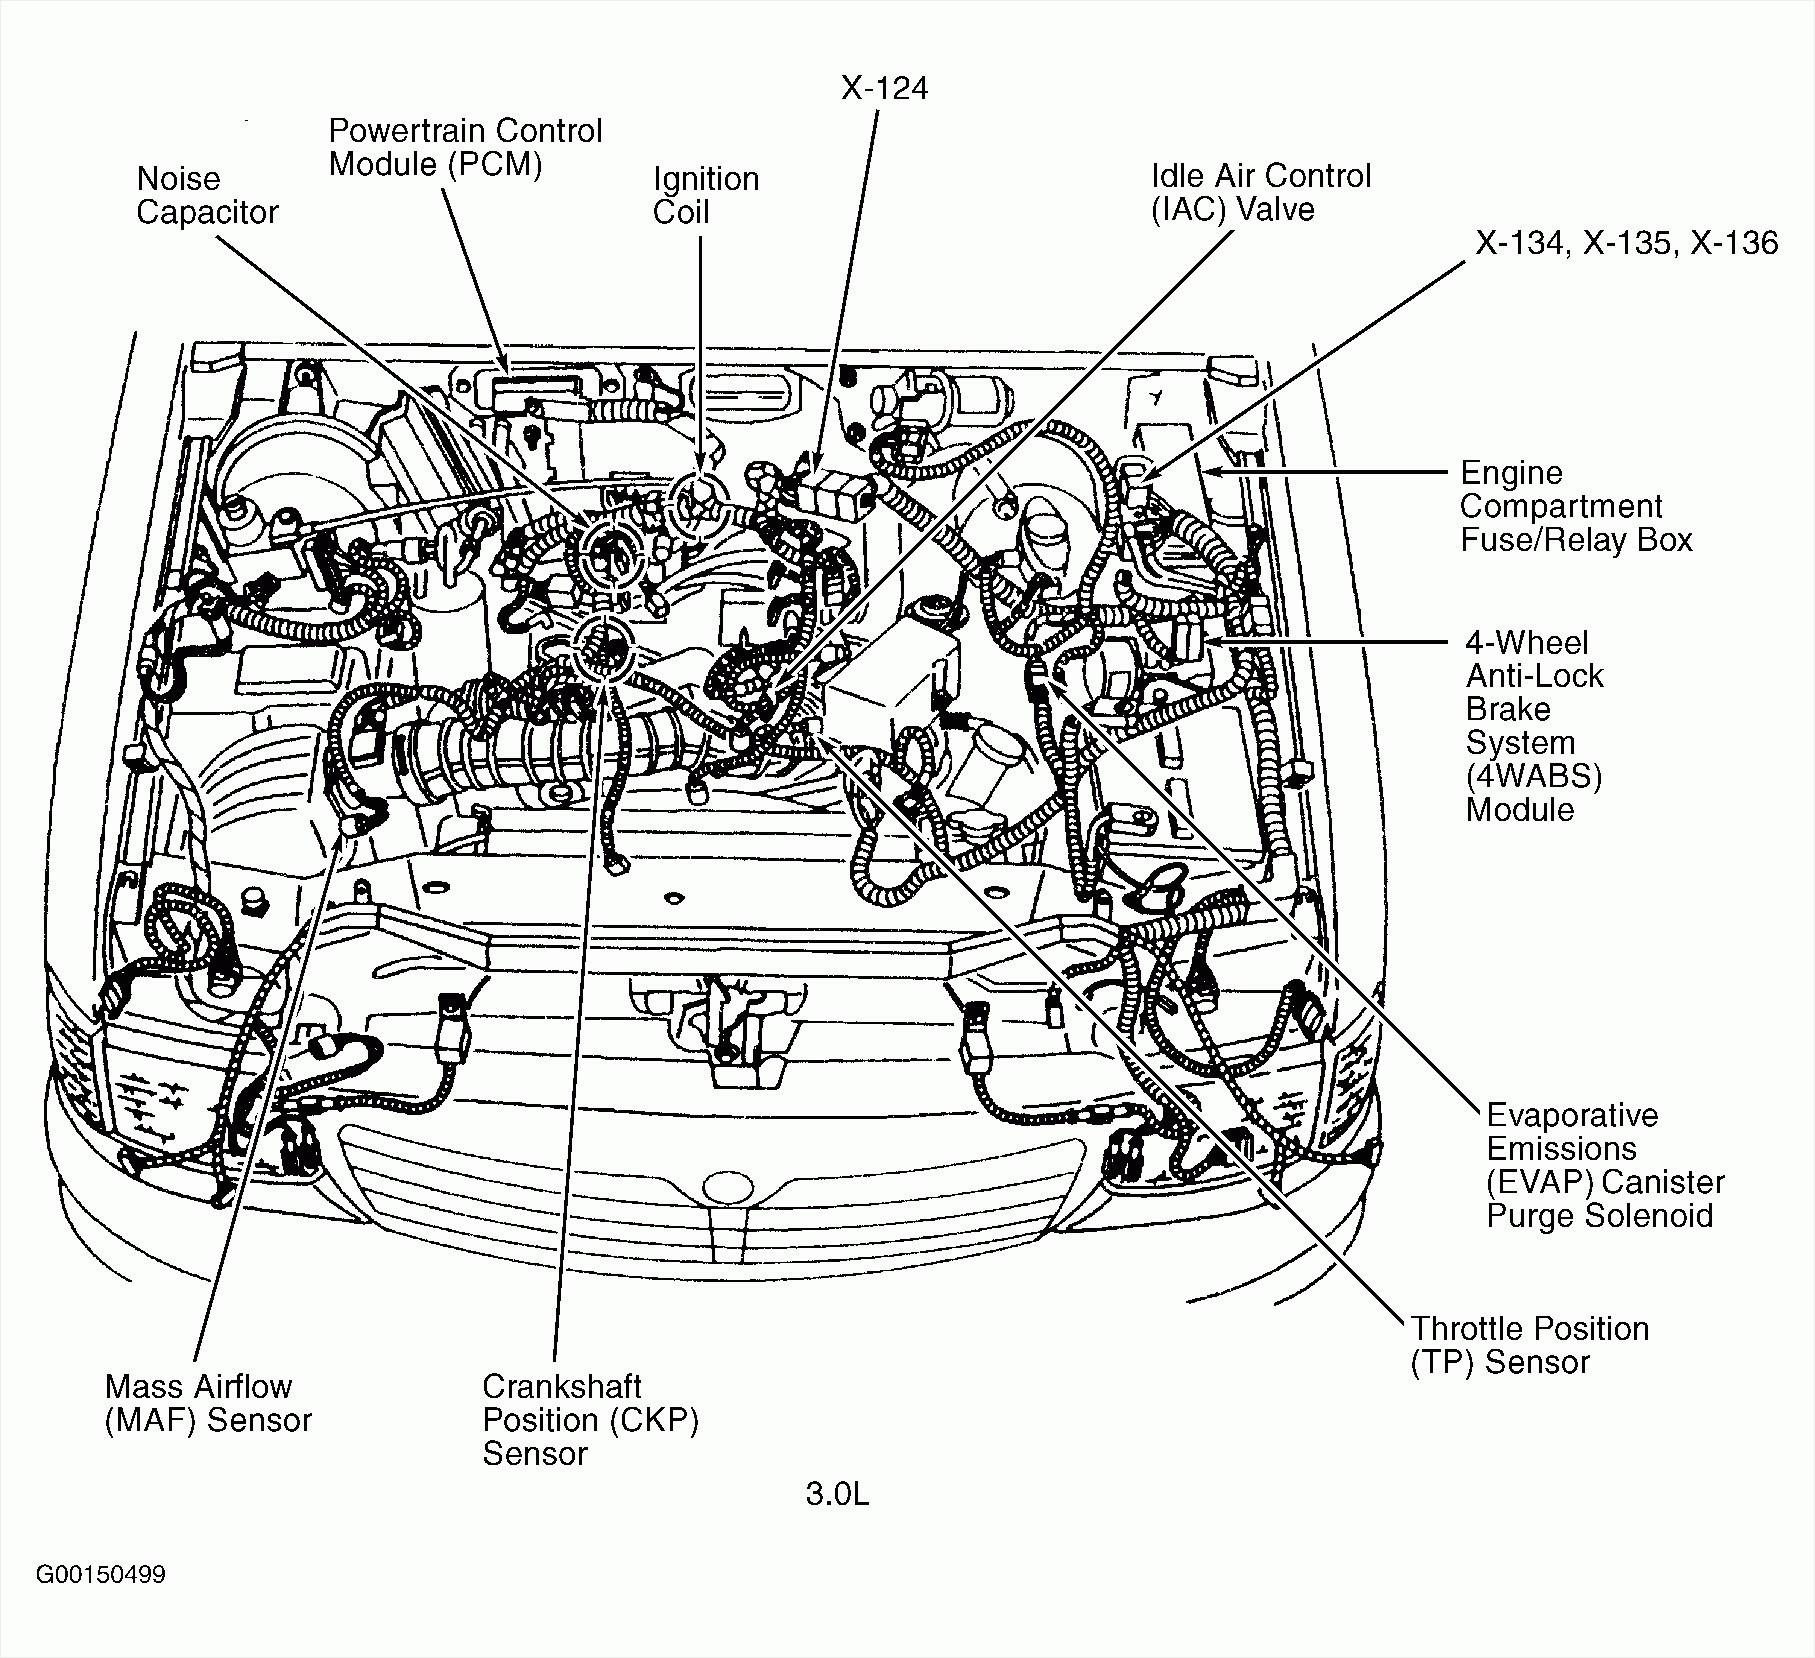 Mini Cooper Engine Bay Diagram Mini Countryman Engine Diagram Wiring Diagram Datasource Of Mini Cooper Engine Bay Diagram